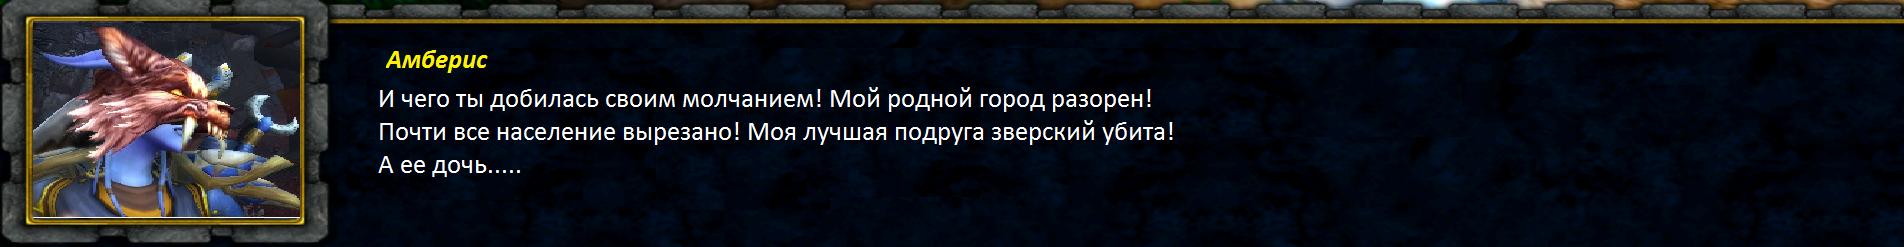 диалог Шаман 9 эпизод 04